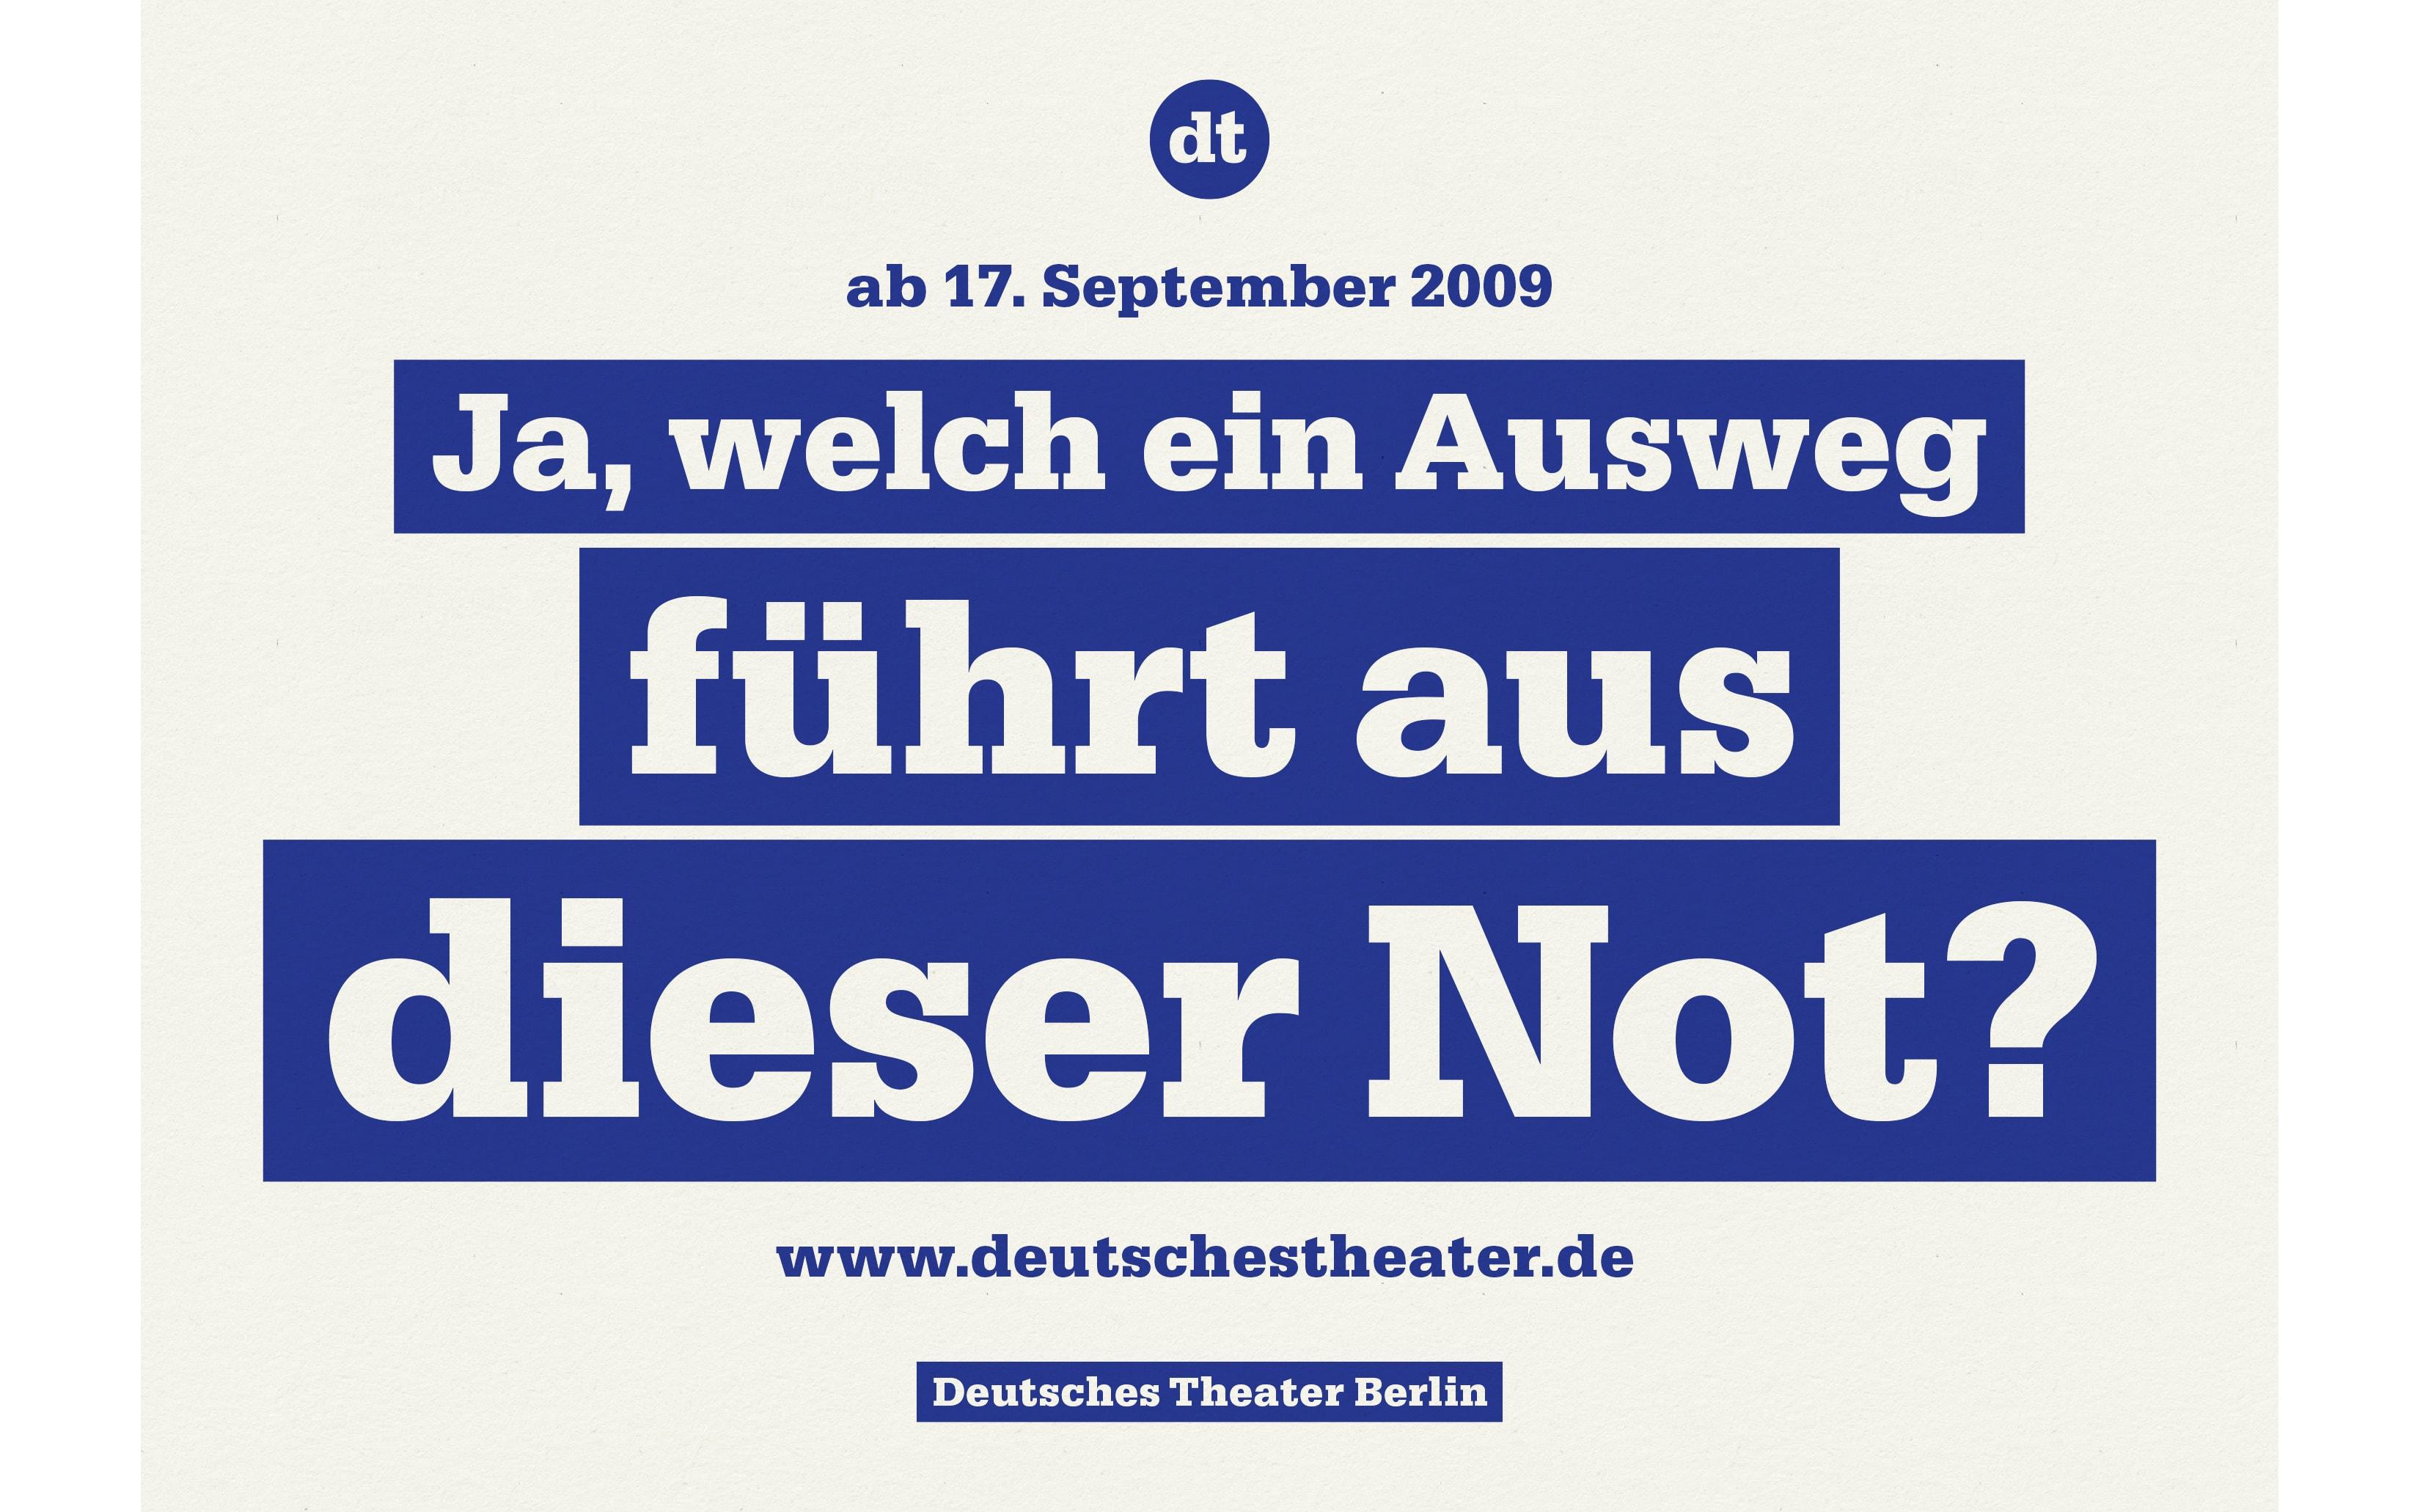 Bureau Johannes Erler – Deutsches Theater Berlin